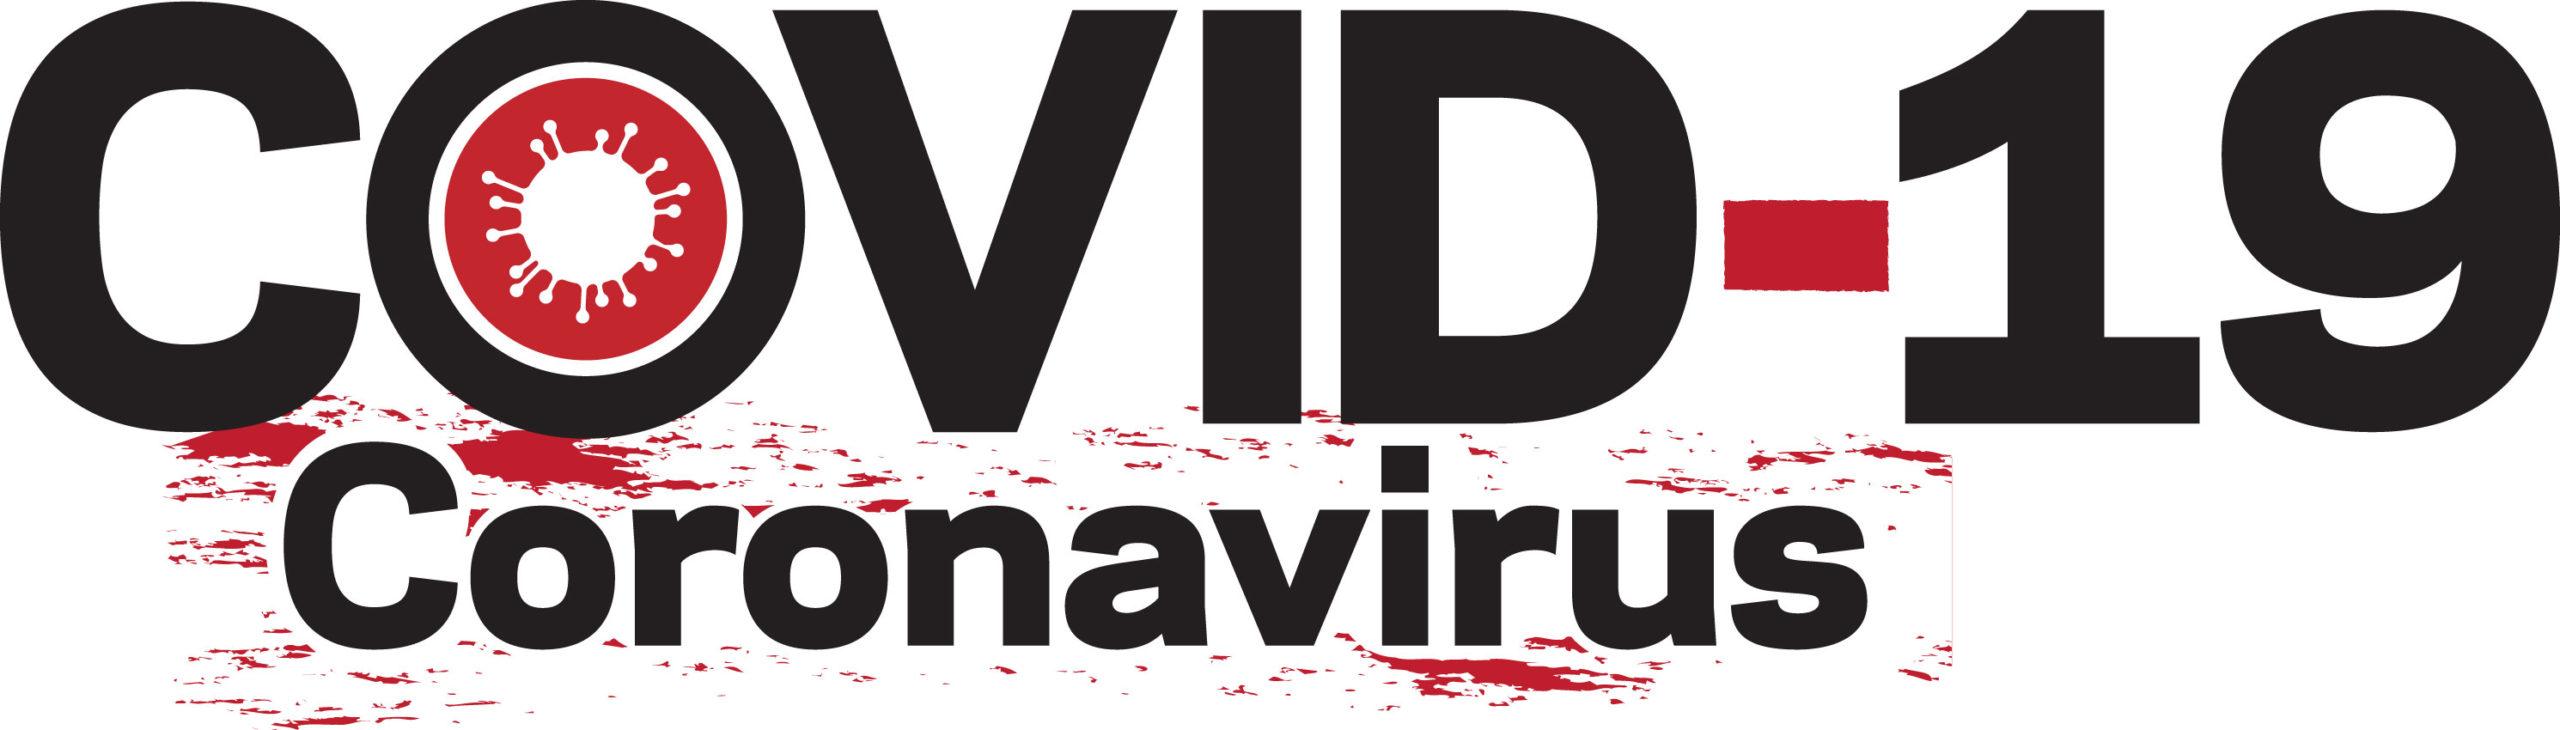 Coronavirus COVID-19 Need-to-Know Info Printable #Coronavirus #COVID19